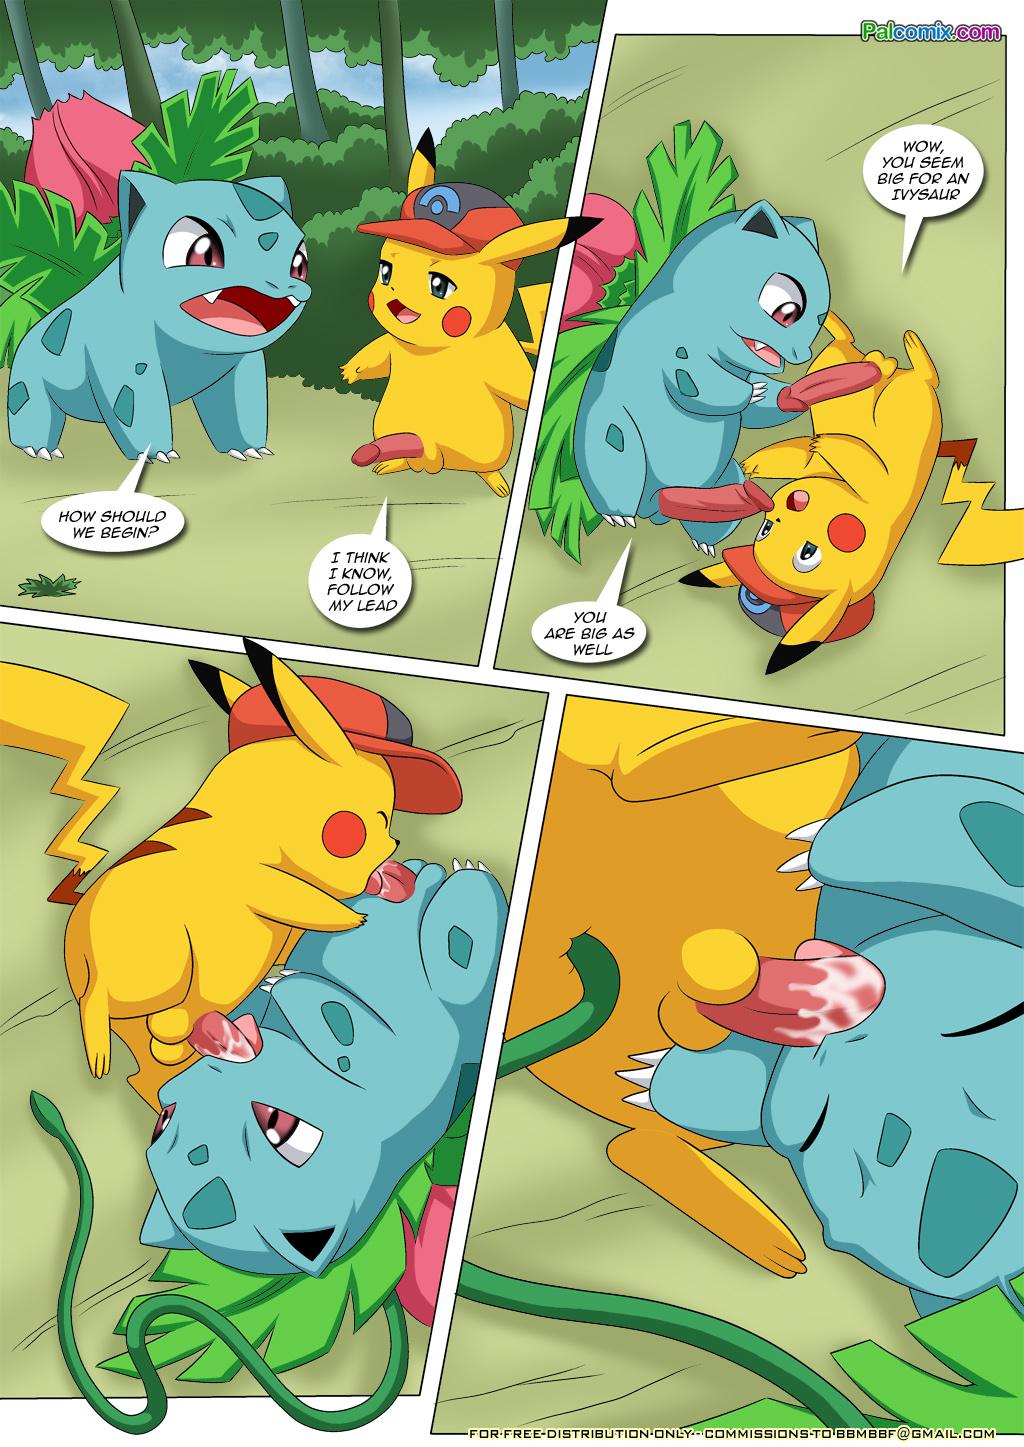 Gay Ash Pokemon Porn within sex pokemon gay$ sex3d pov